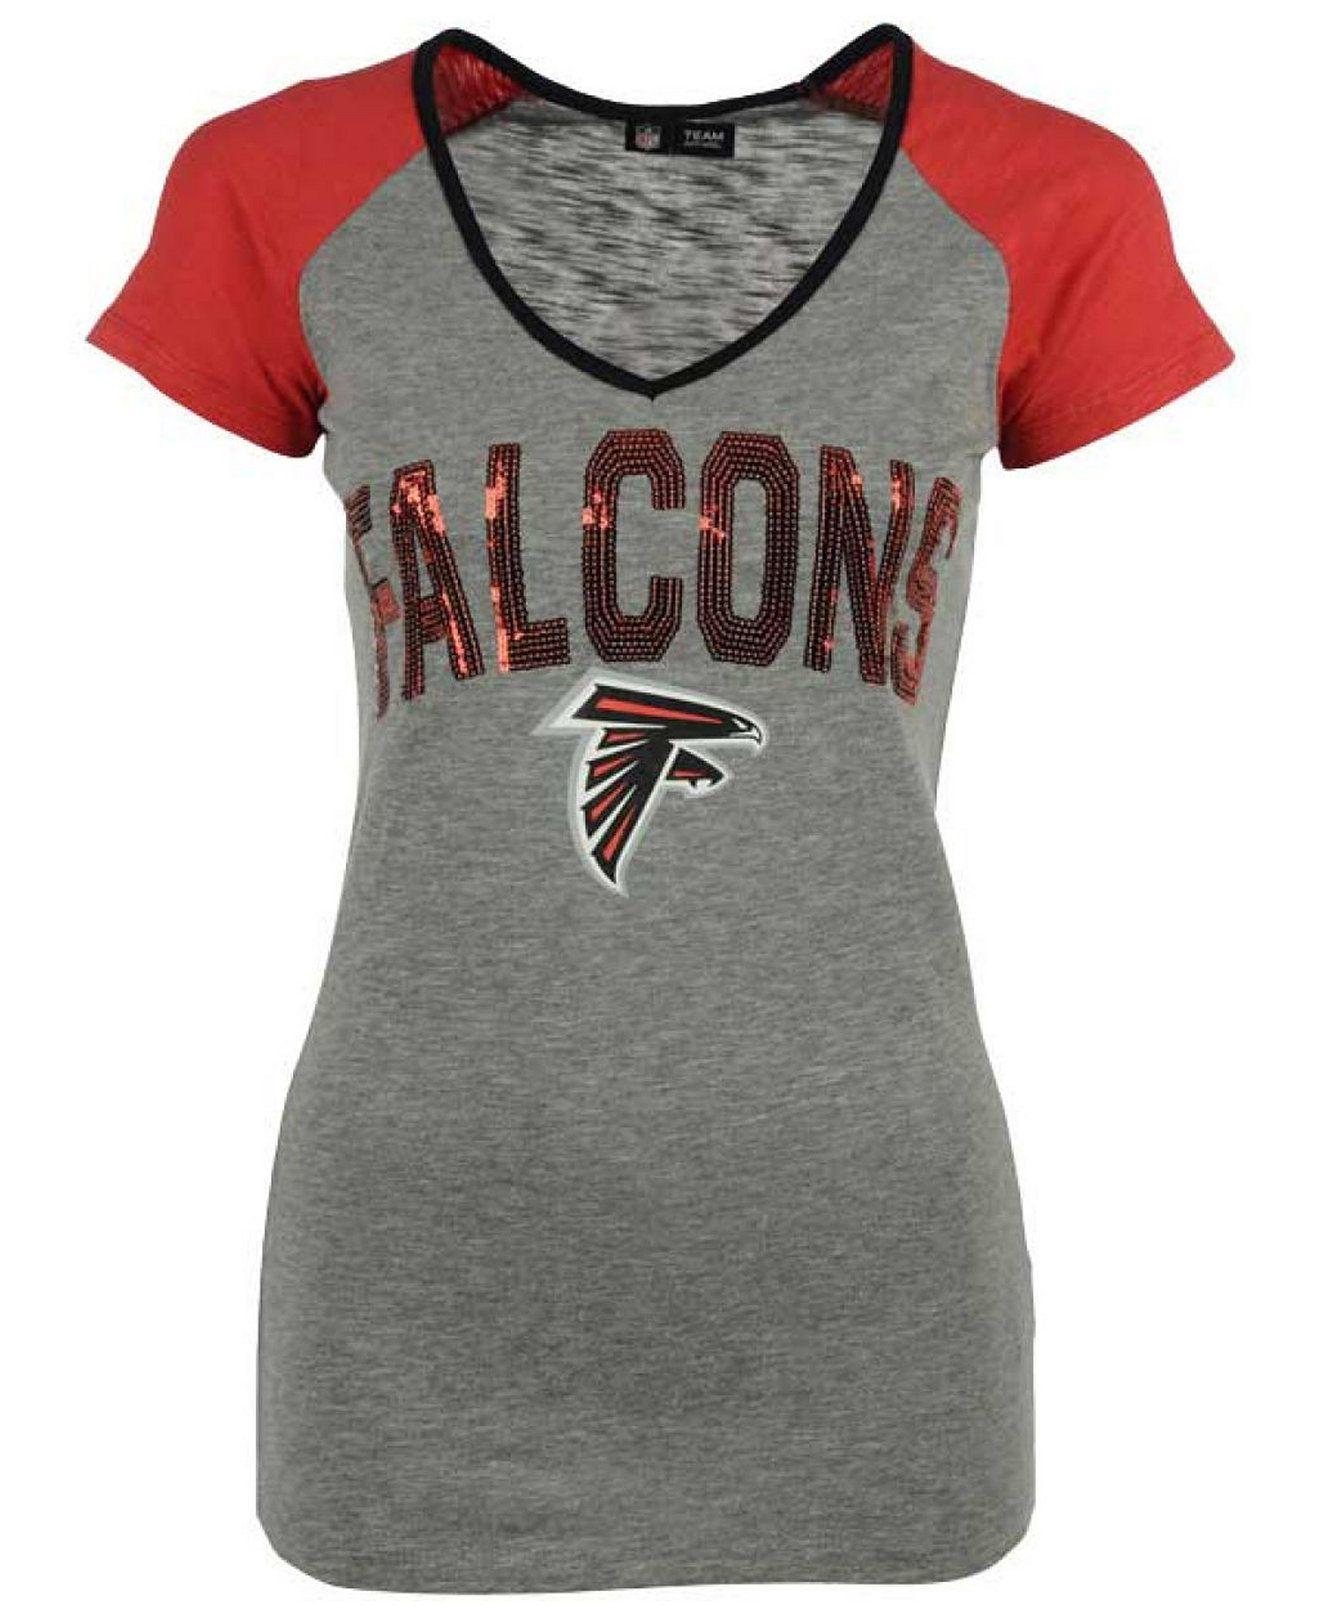 5th & Ocean Women s Atlanta Falcons Sequin T Shirt Sports Fan Shop